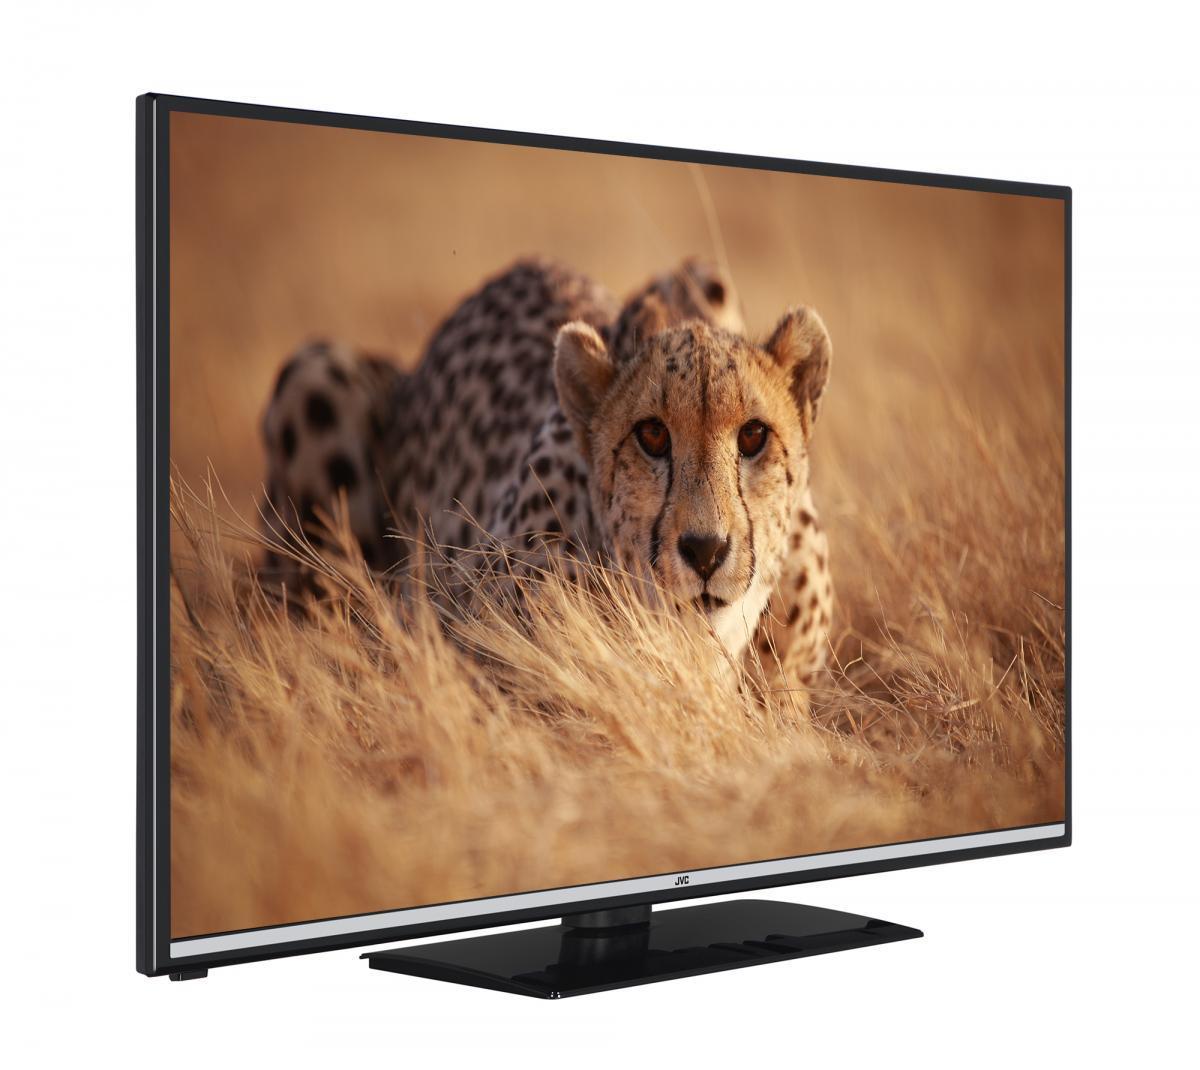 "Bild 2 von JVC LED TV 50"" (127 cm)"